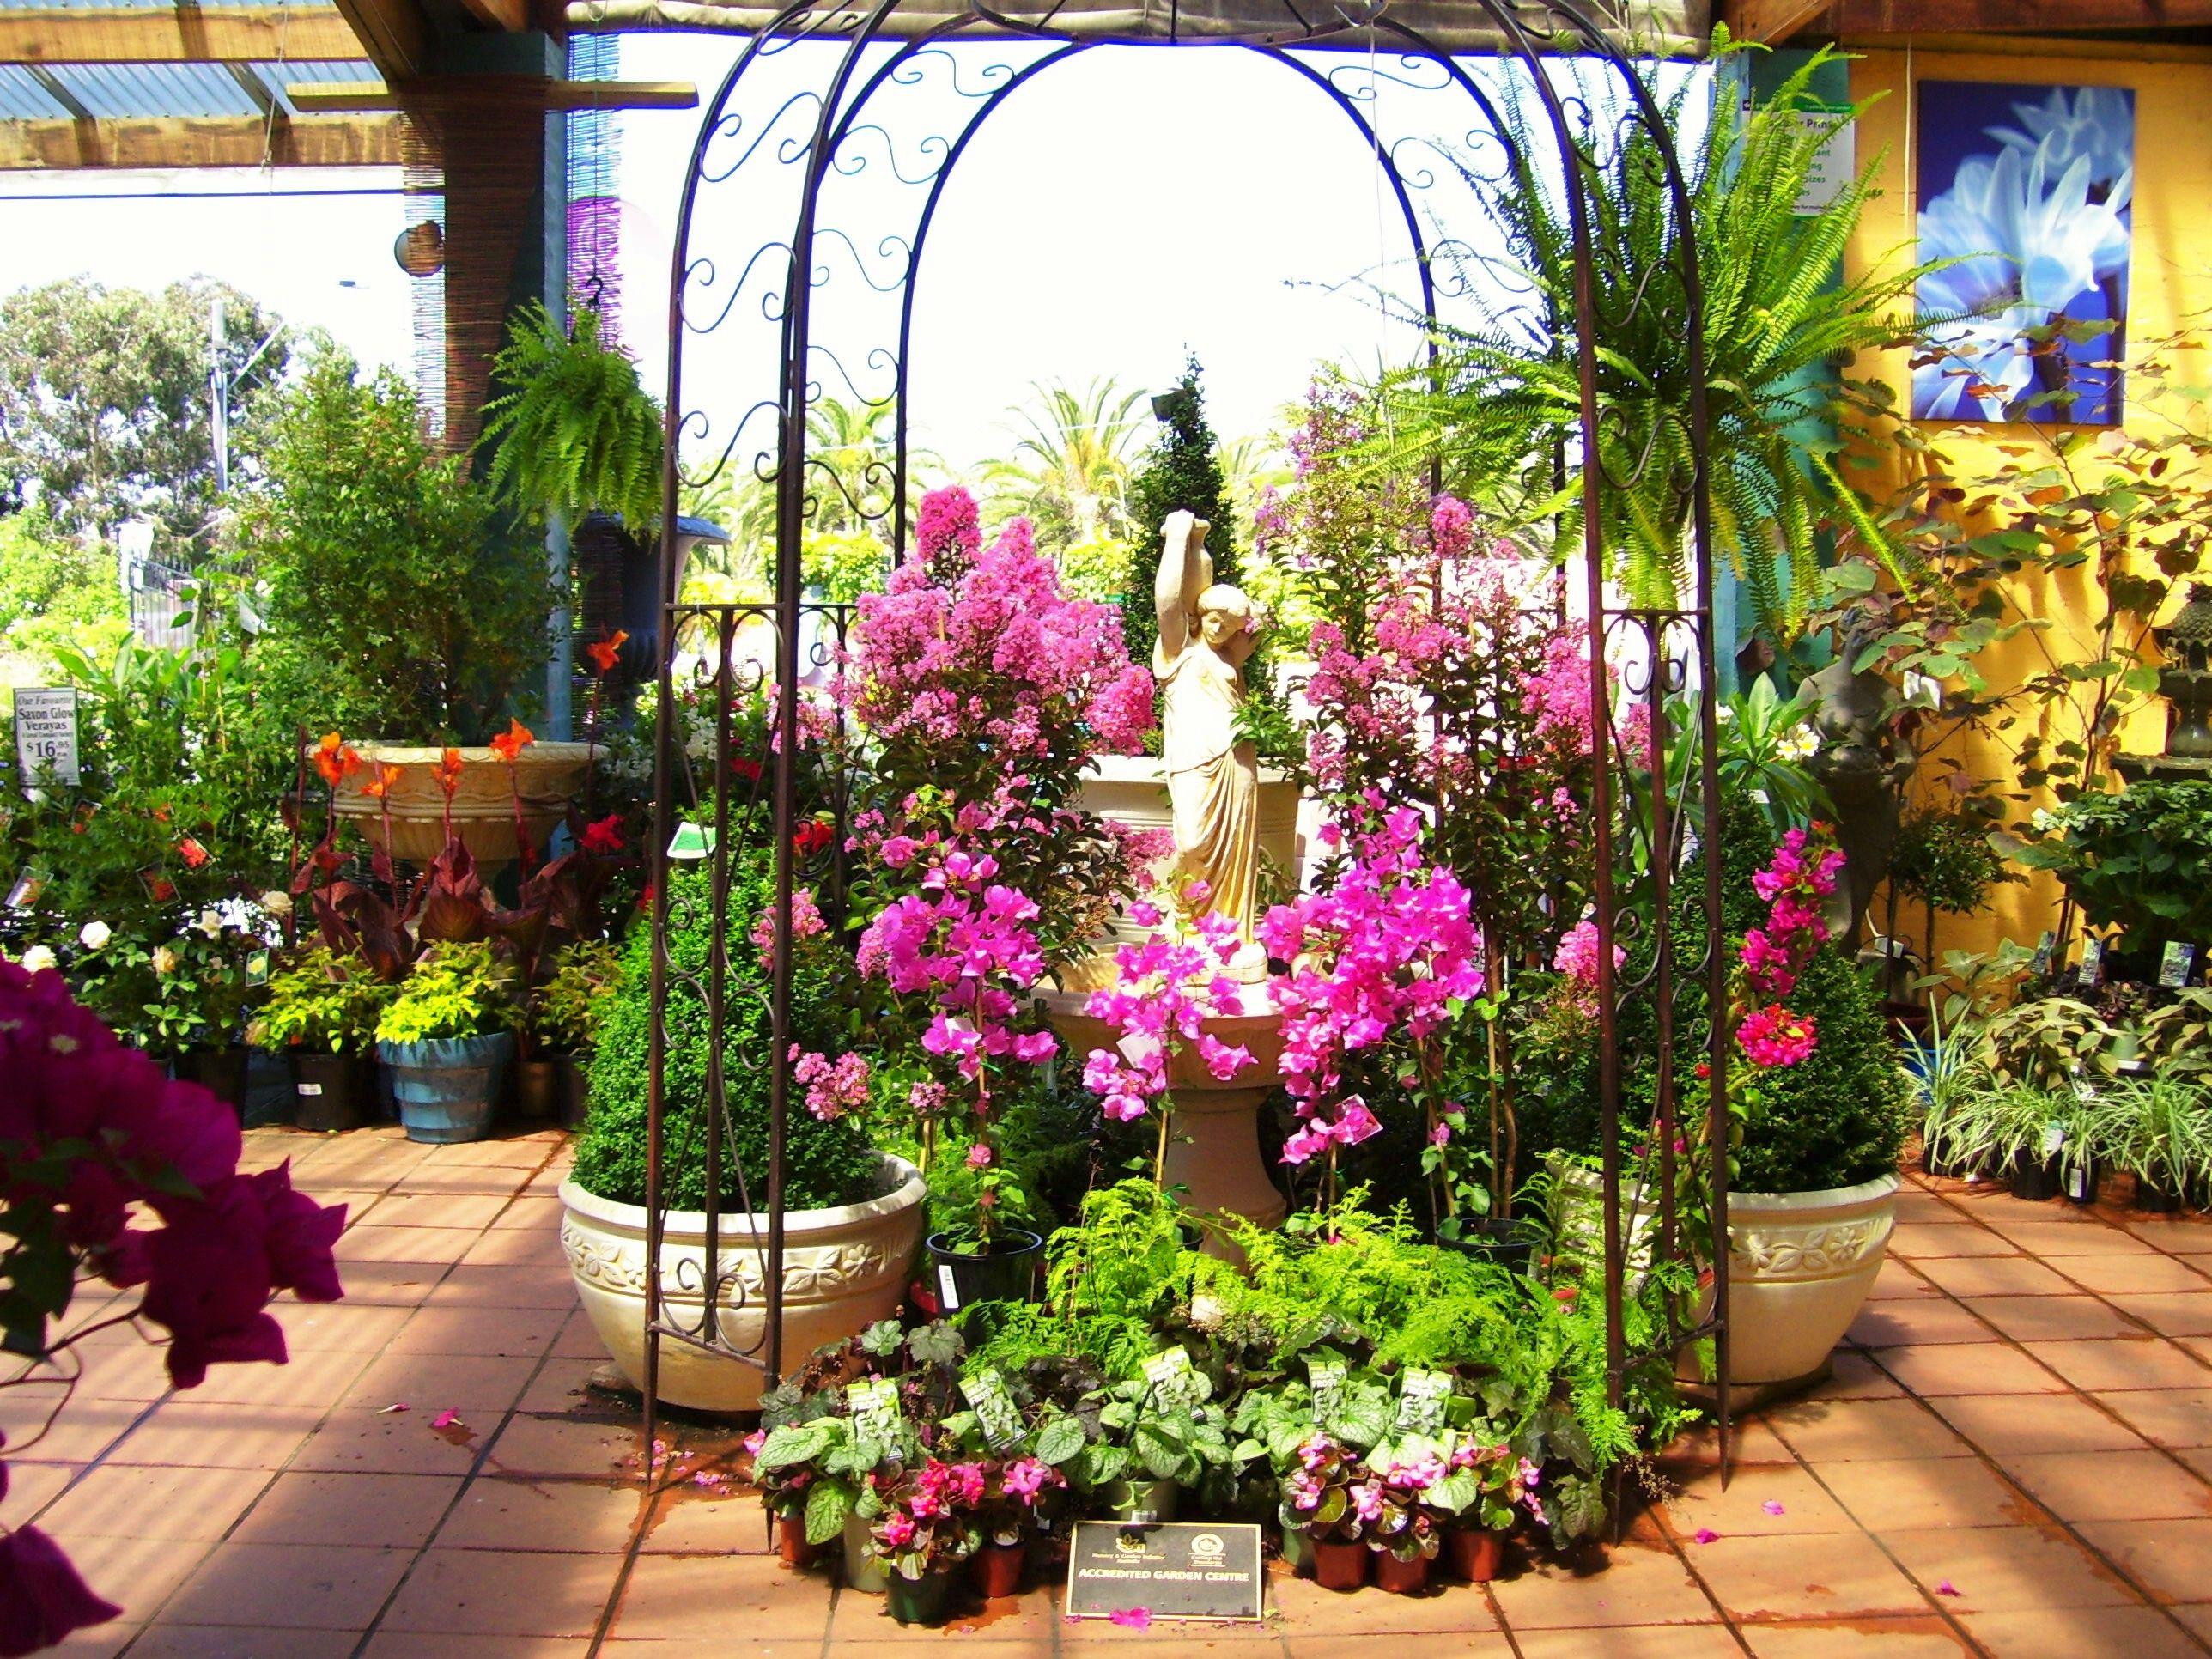 Beautiful Display To A Garden Nursery Essendon Photo By Dana Bonn Australia Garden Center Displays Plants Plant Nursery